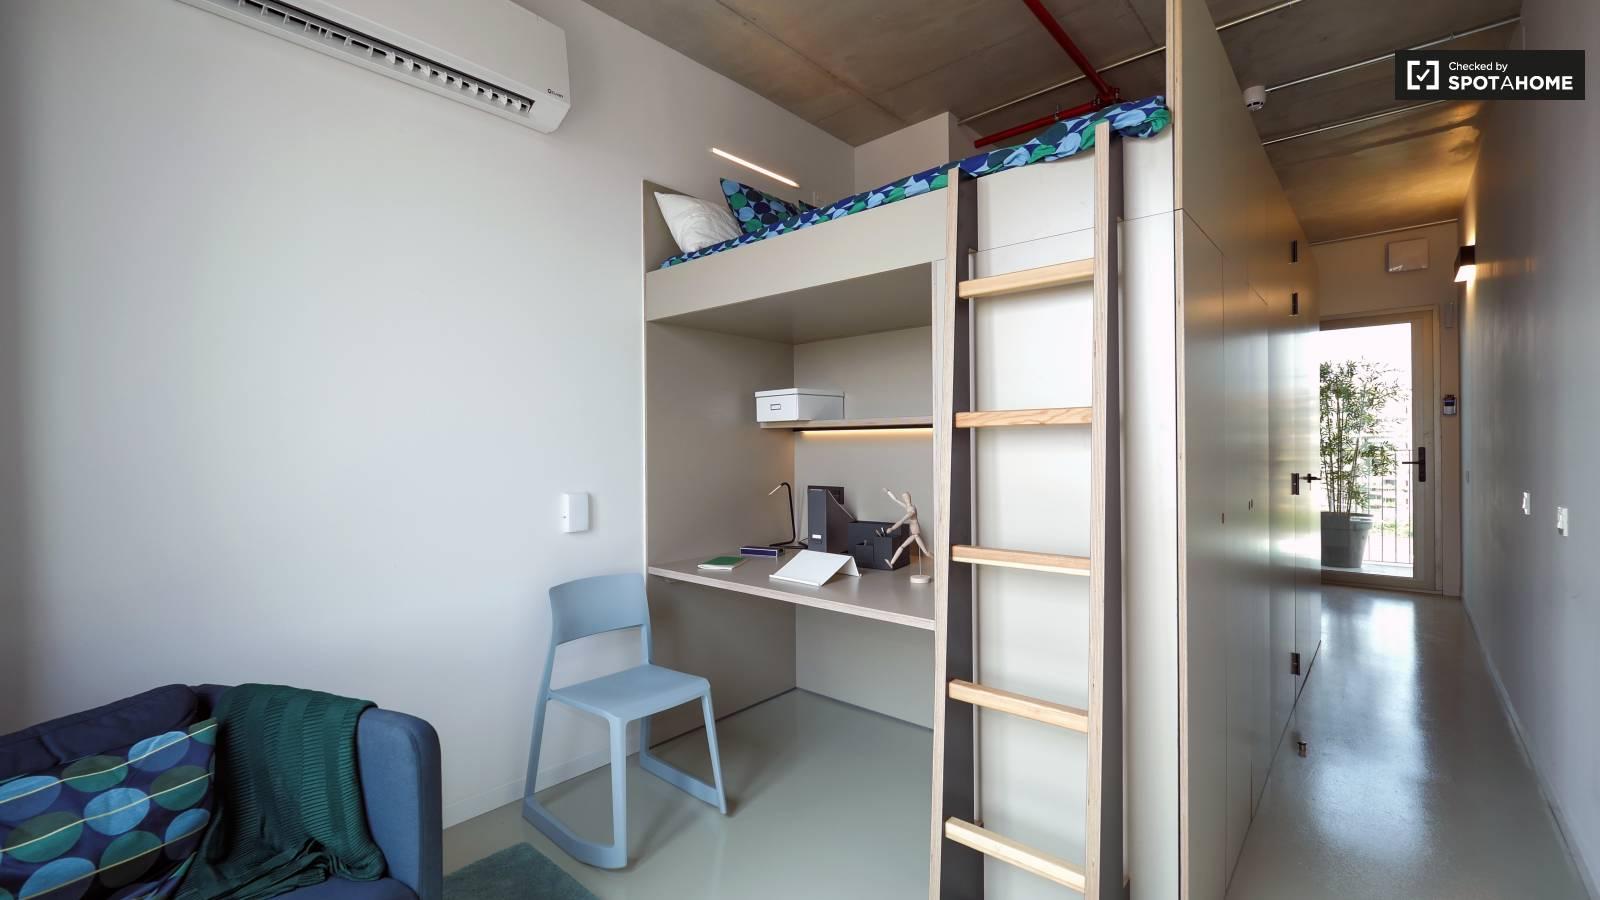 Loft sleeping area